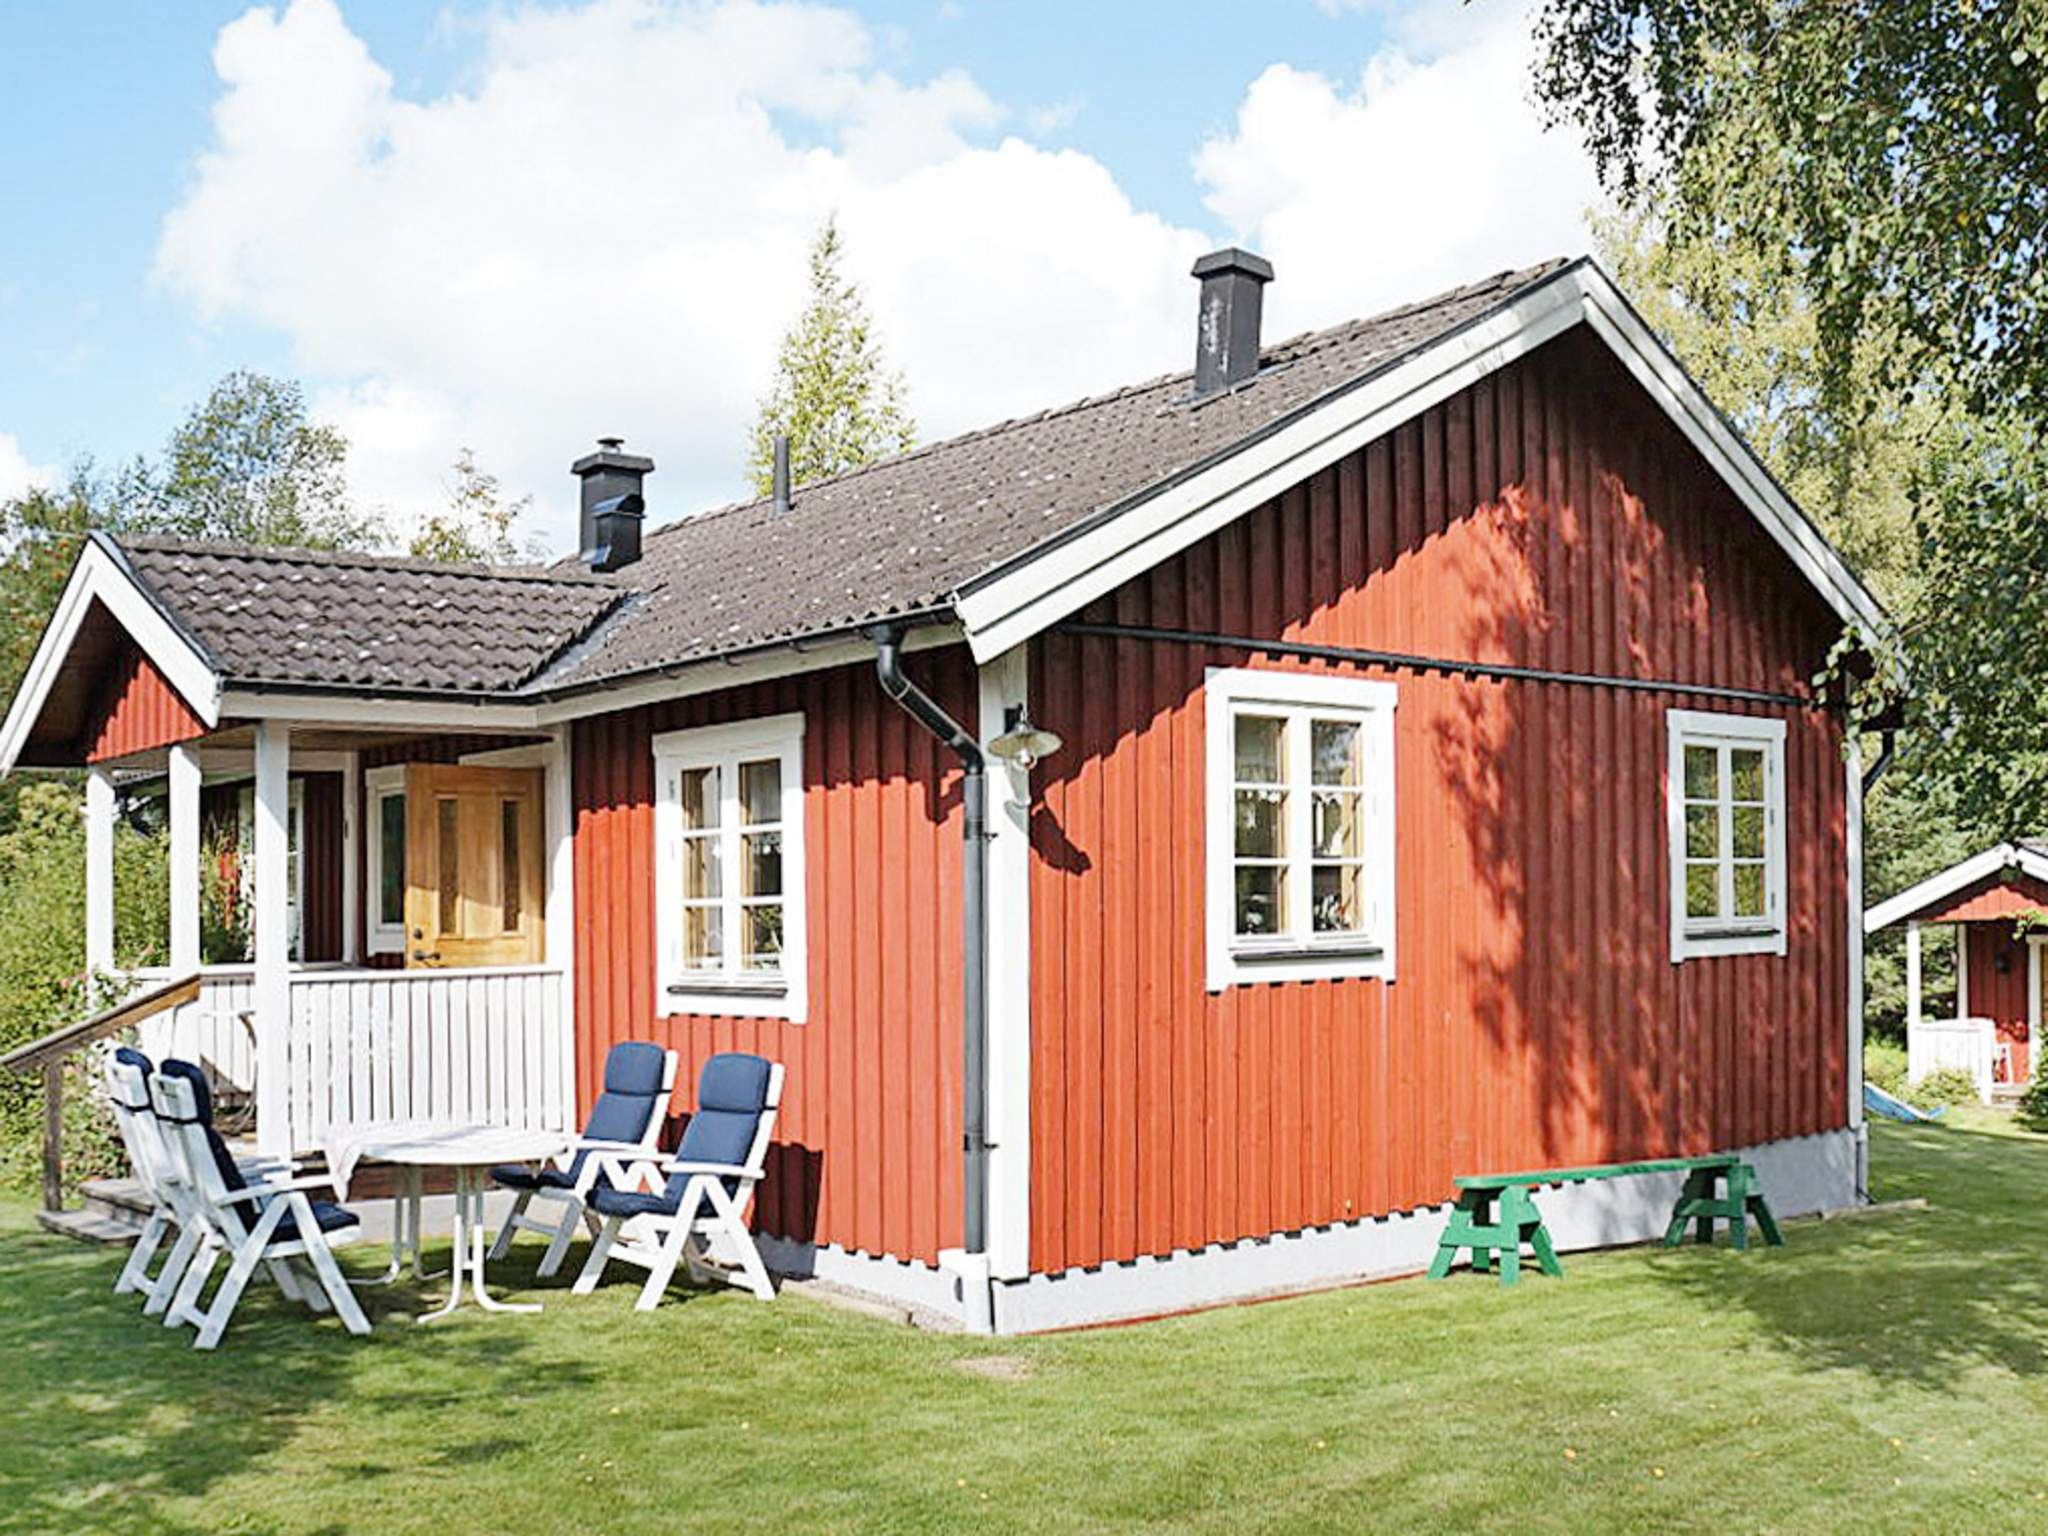 Ferienhaus Motala (921156), Motala, Östergötlands län, Südschweden, Schweden, Bild 1